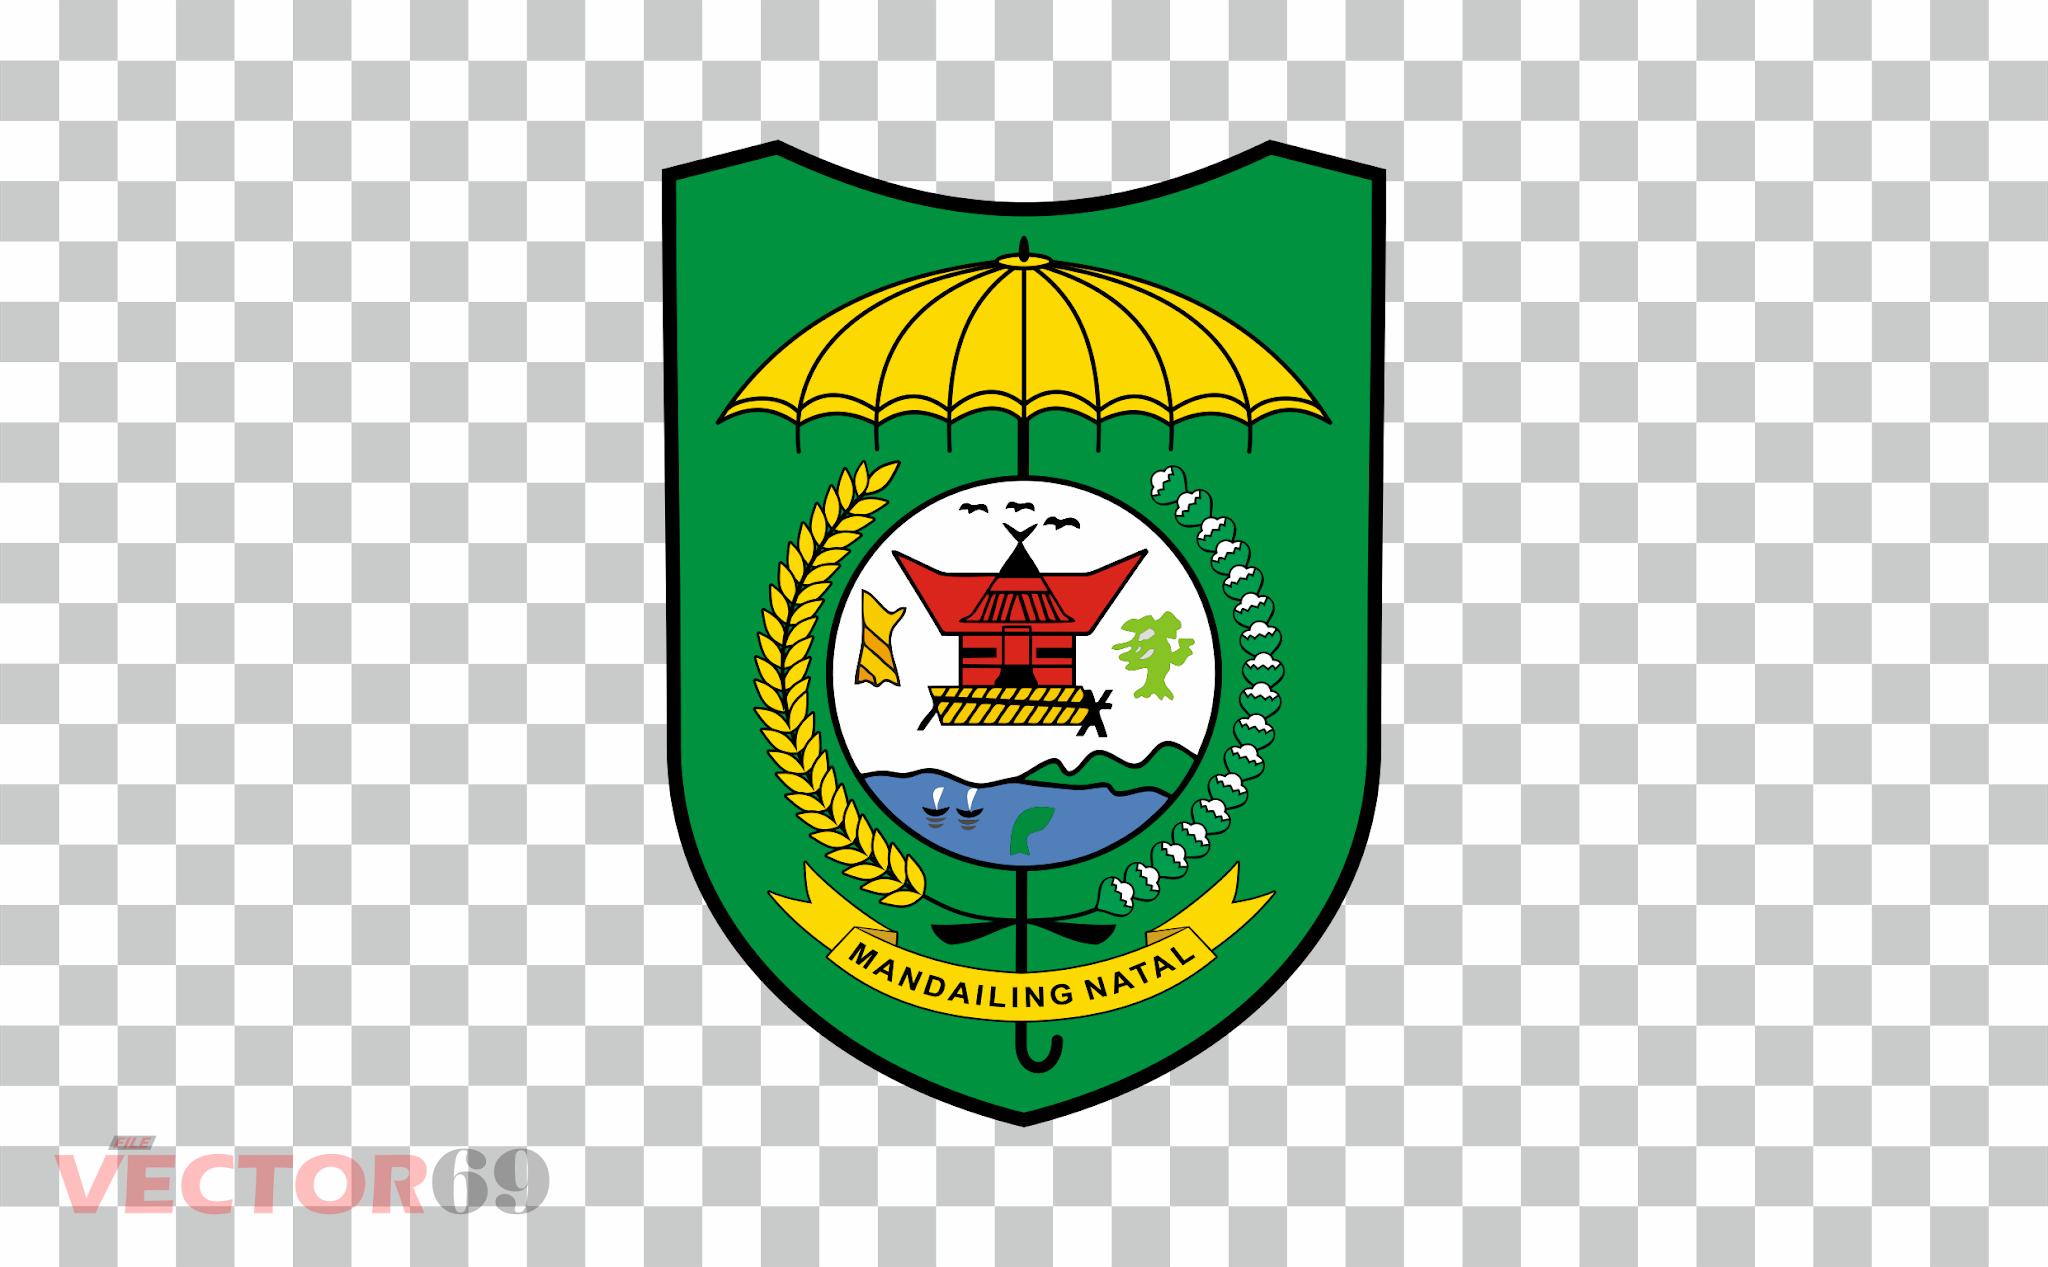 Kabupaten Mandailing Natal Logo - Download Vector File PNG (Portable Network Graphics)